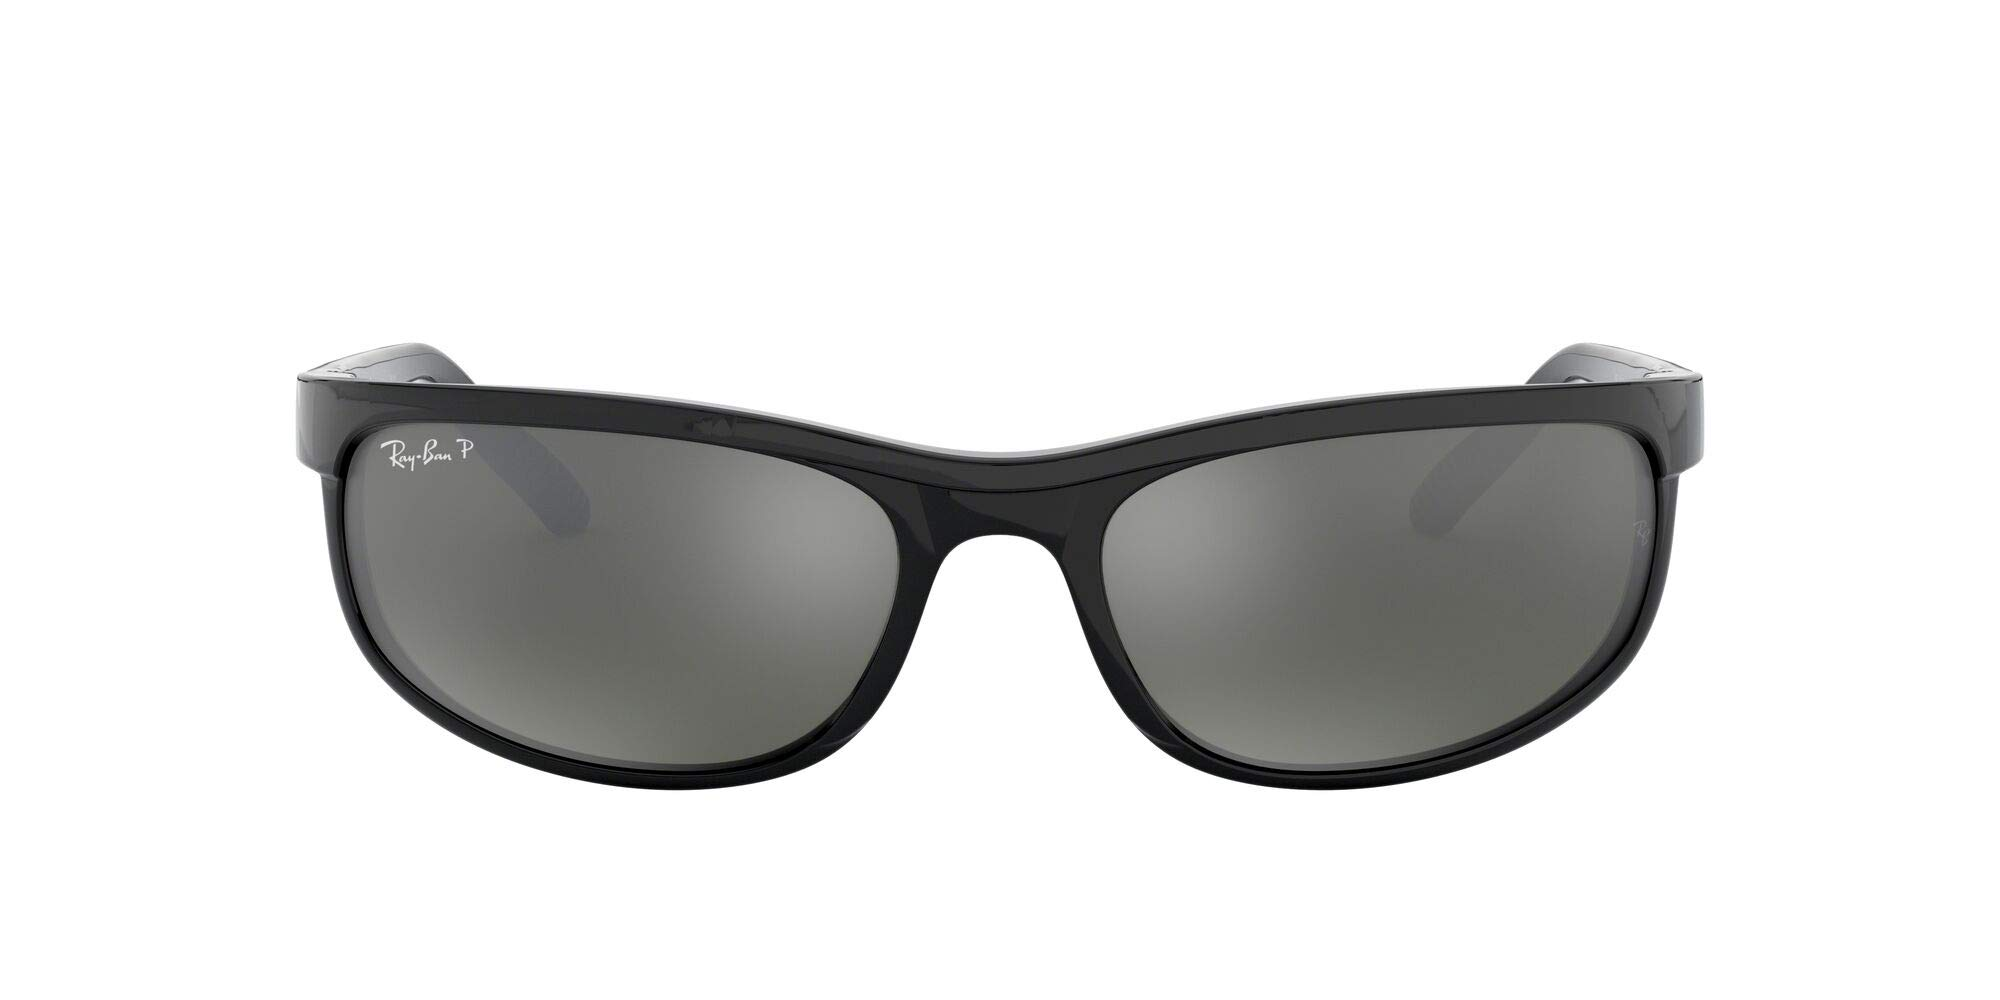 Ray Ban Predator Rectangular Sunglasses Polarized